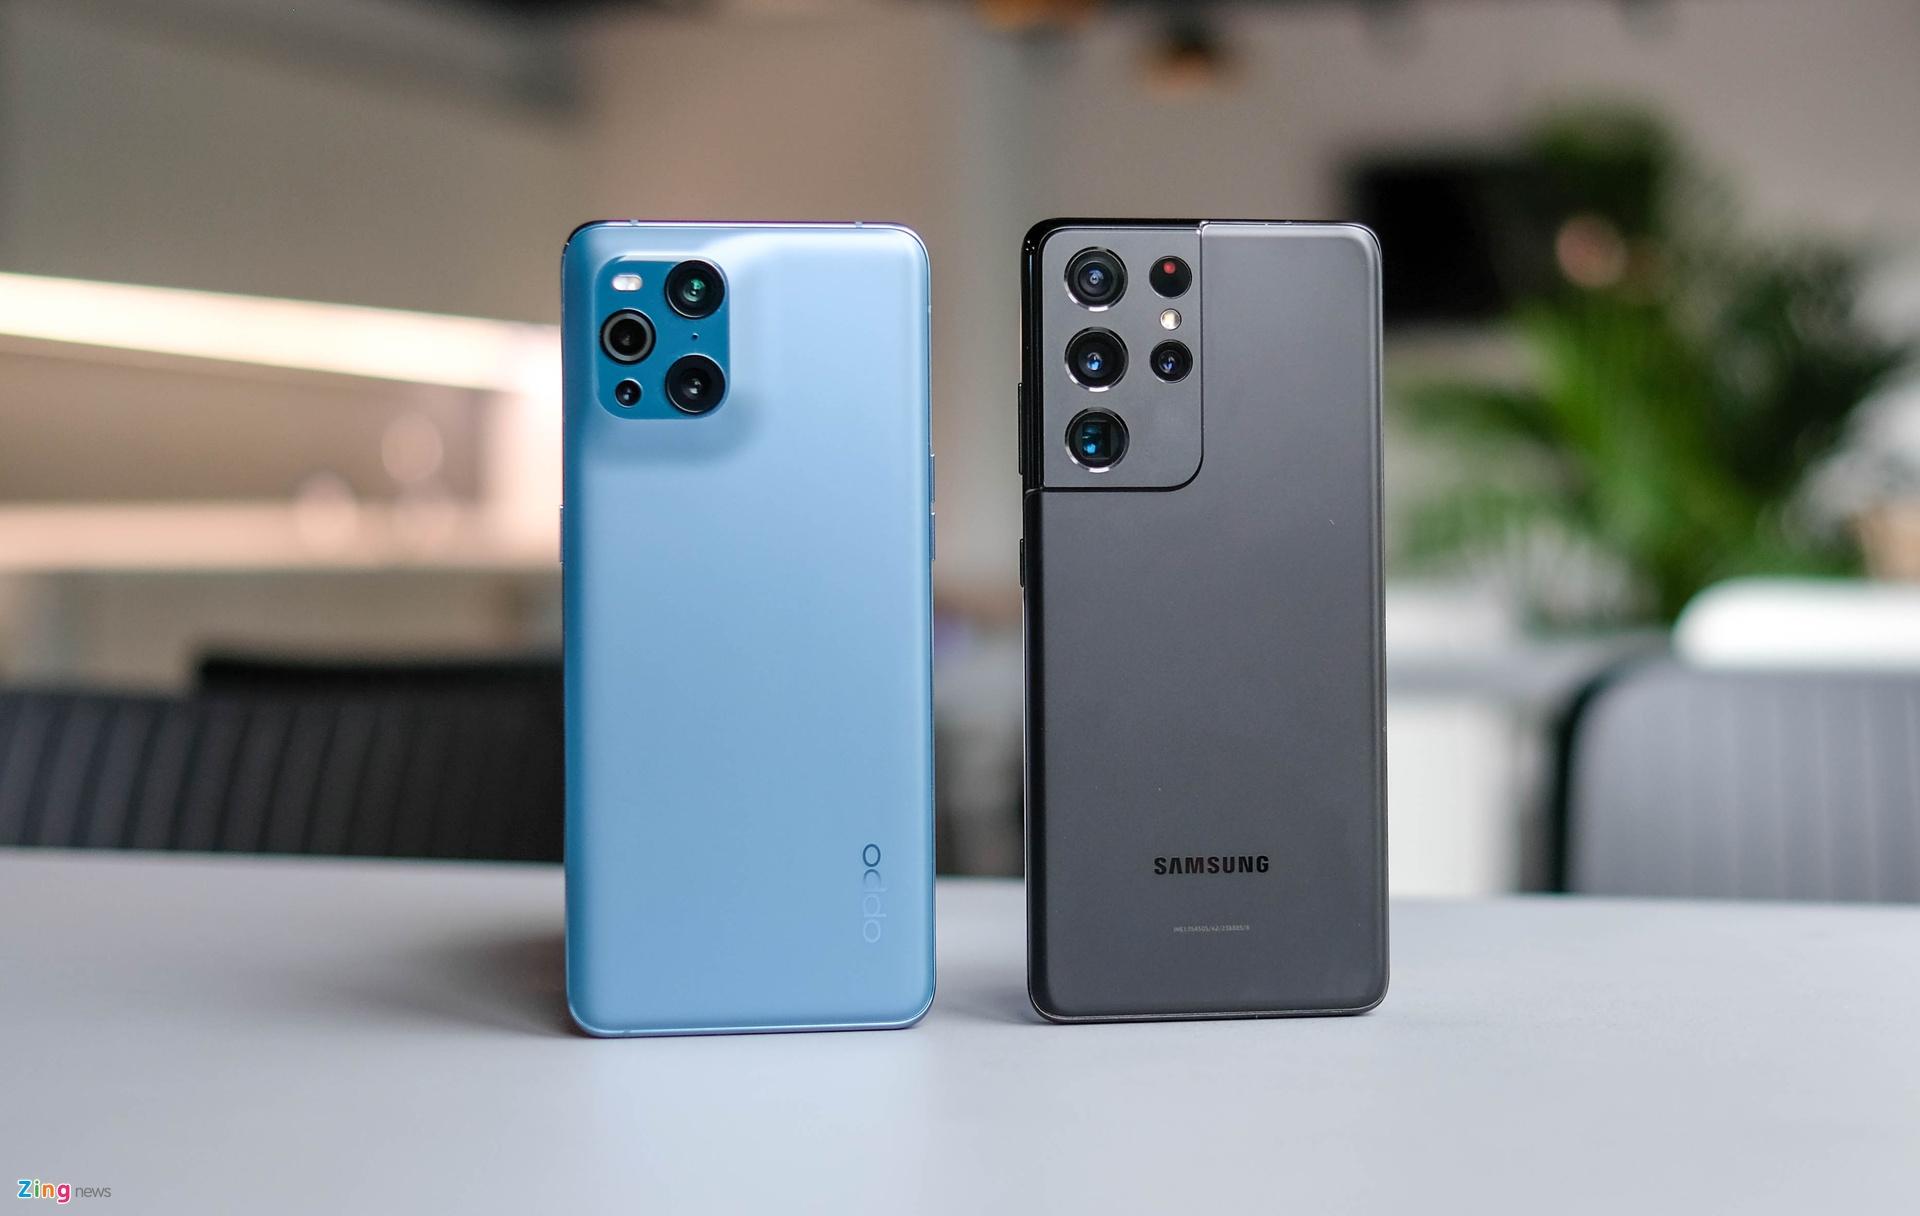 So sánh Oppo Find X3 Pro với Galaxy S21 Ultra 5G